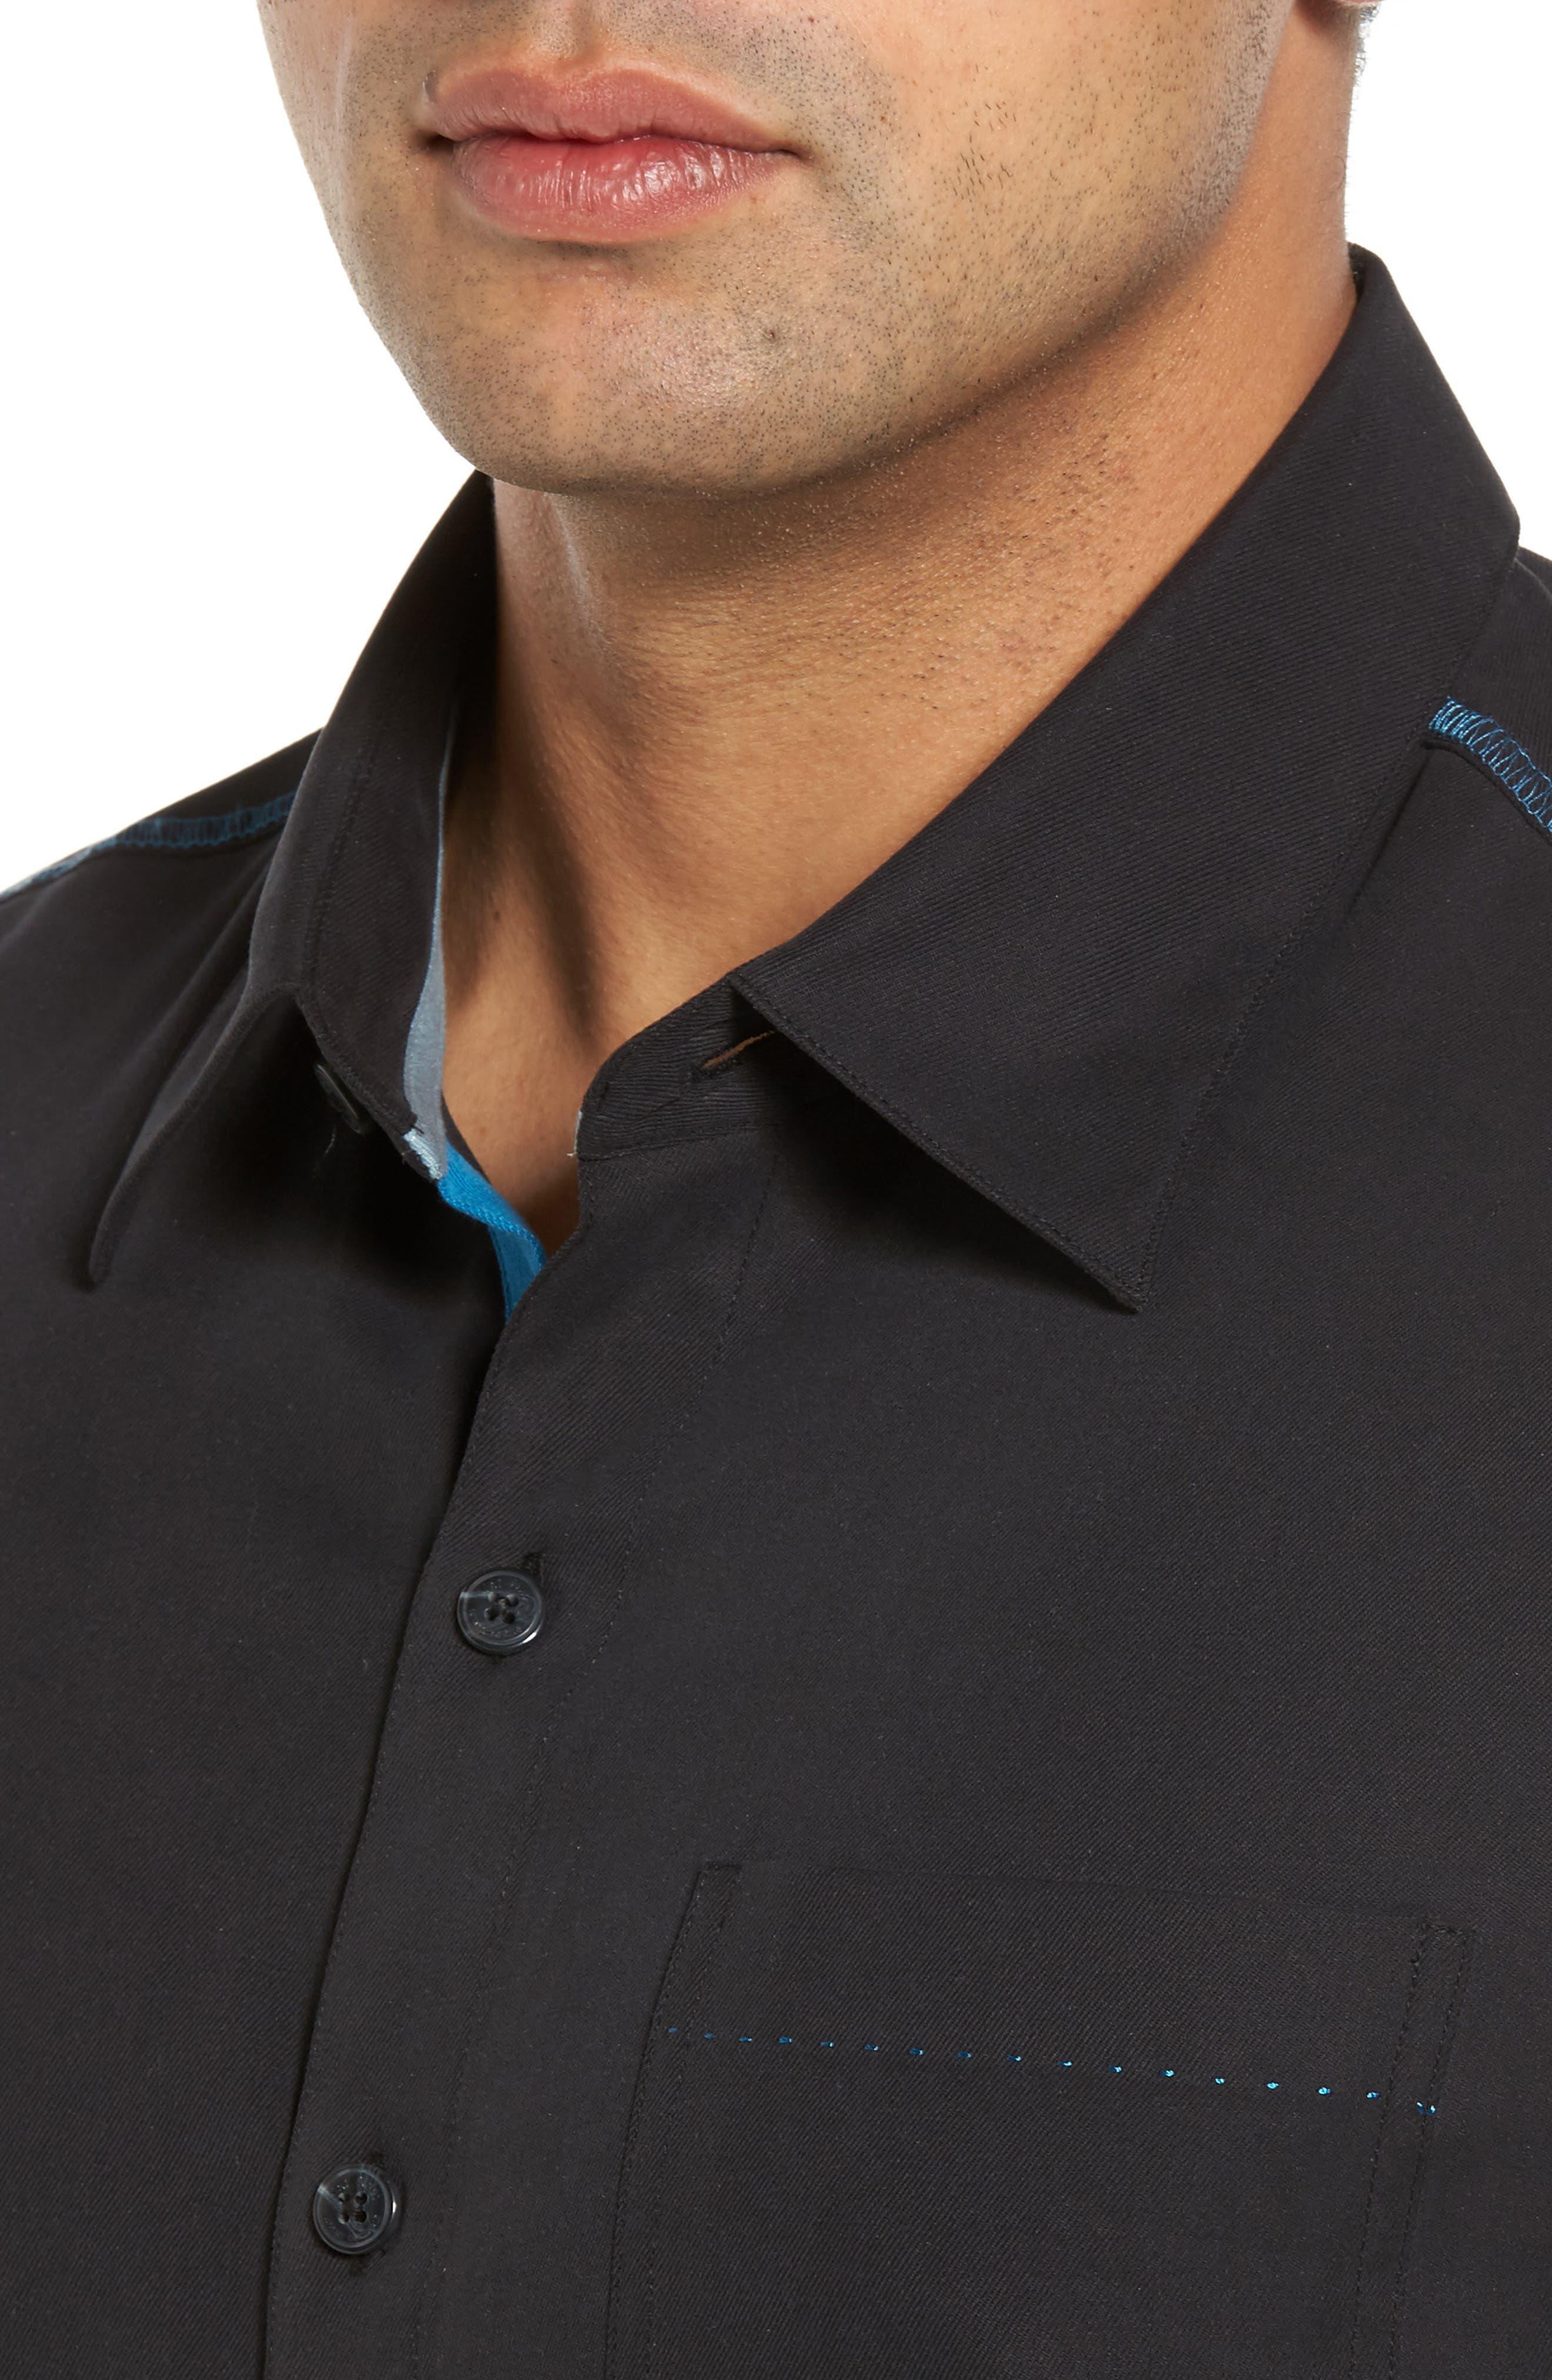 New Originals Silk Sport Shirt,                             Alternate thumbnail 4, color,                             Black